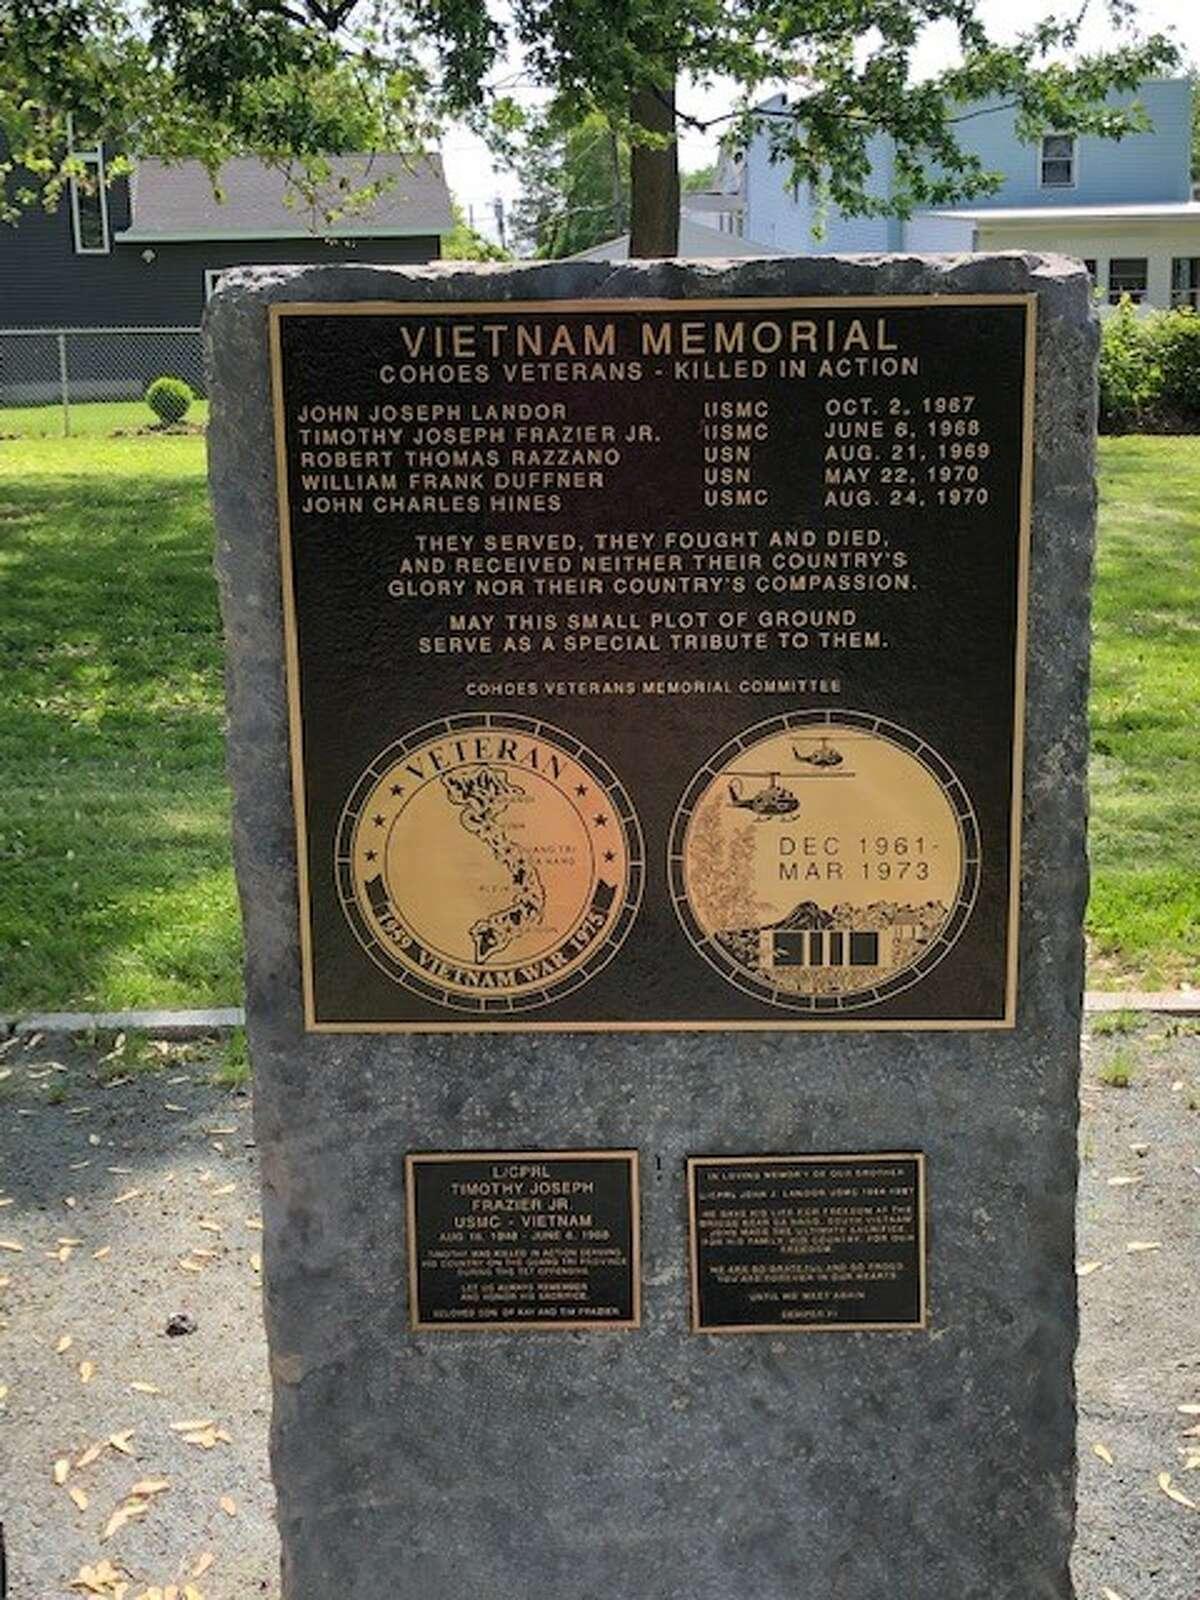 Vietnam Memorial commemorates Cohoes veterans killed in action. (Cohoes Veterans Memorial Park Committee)